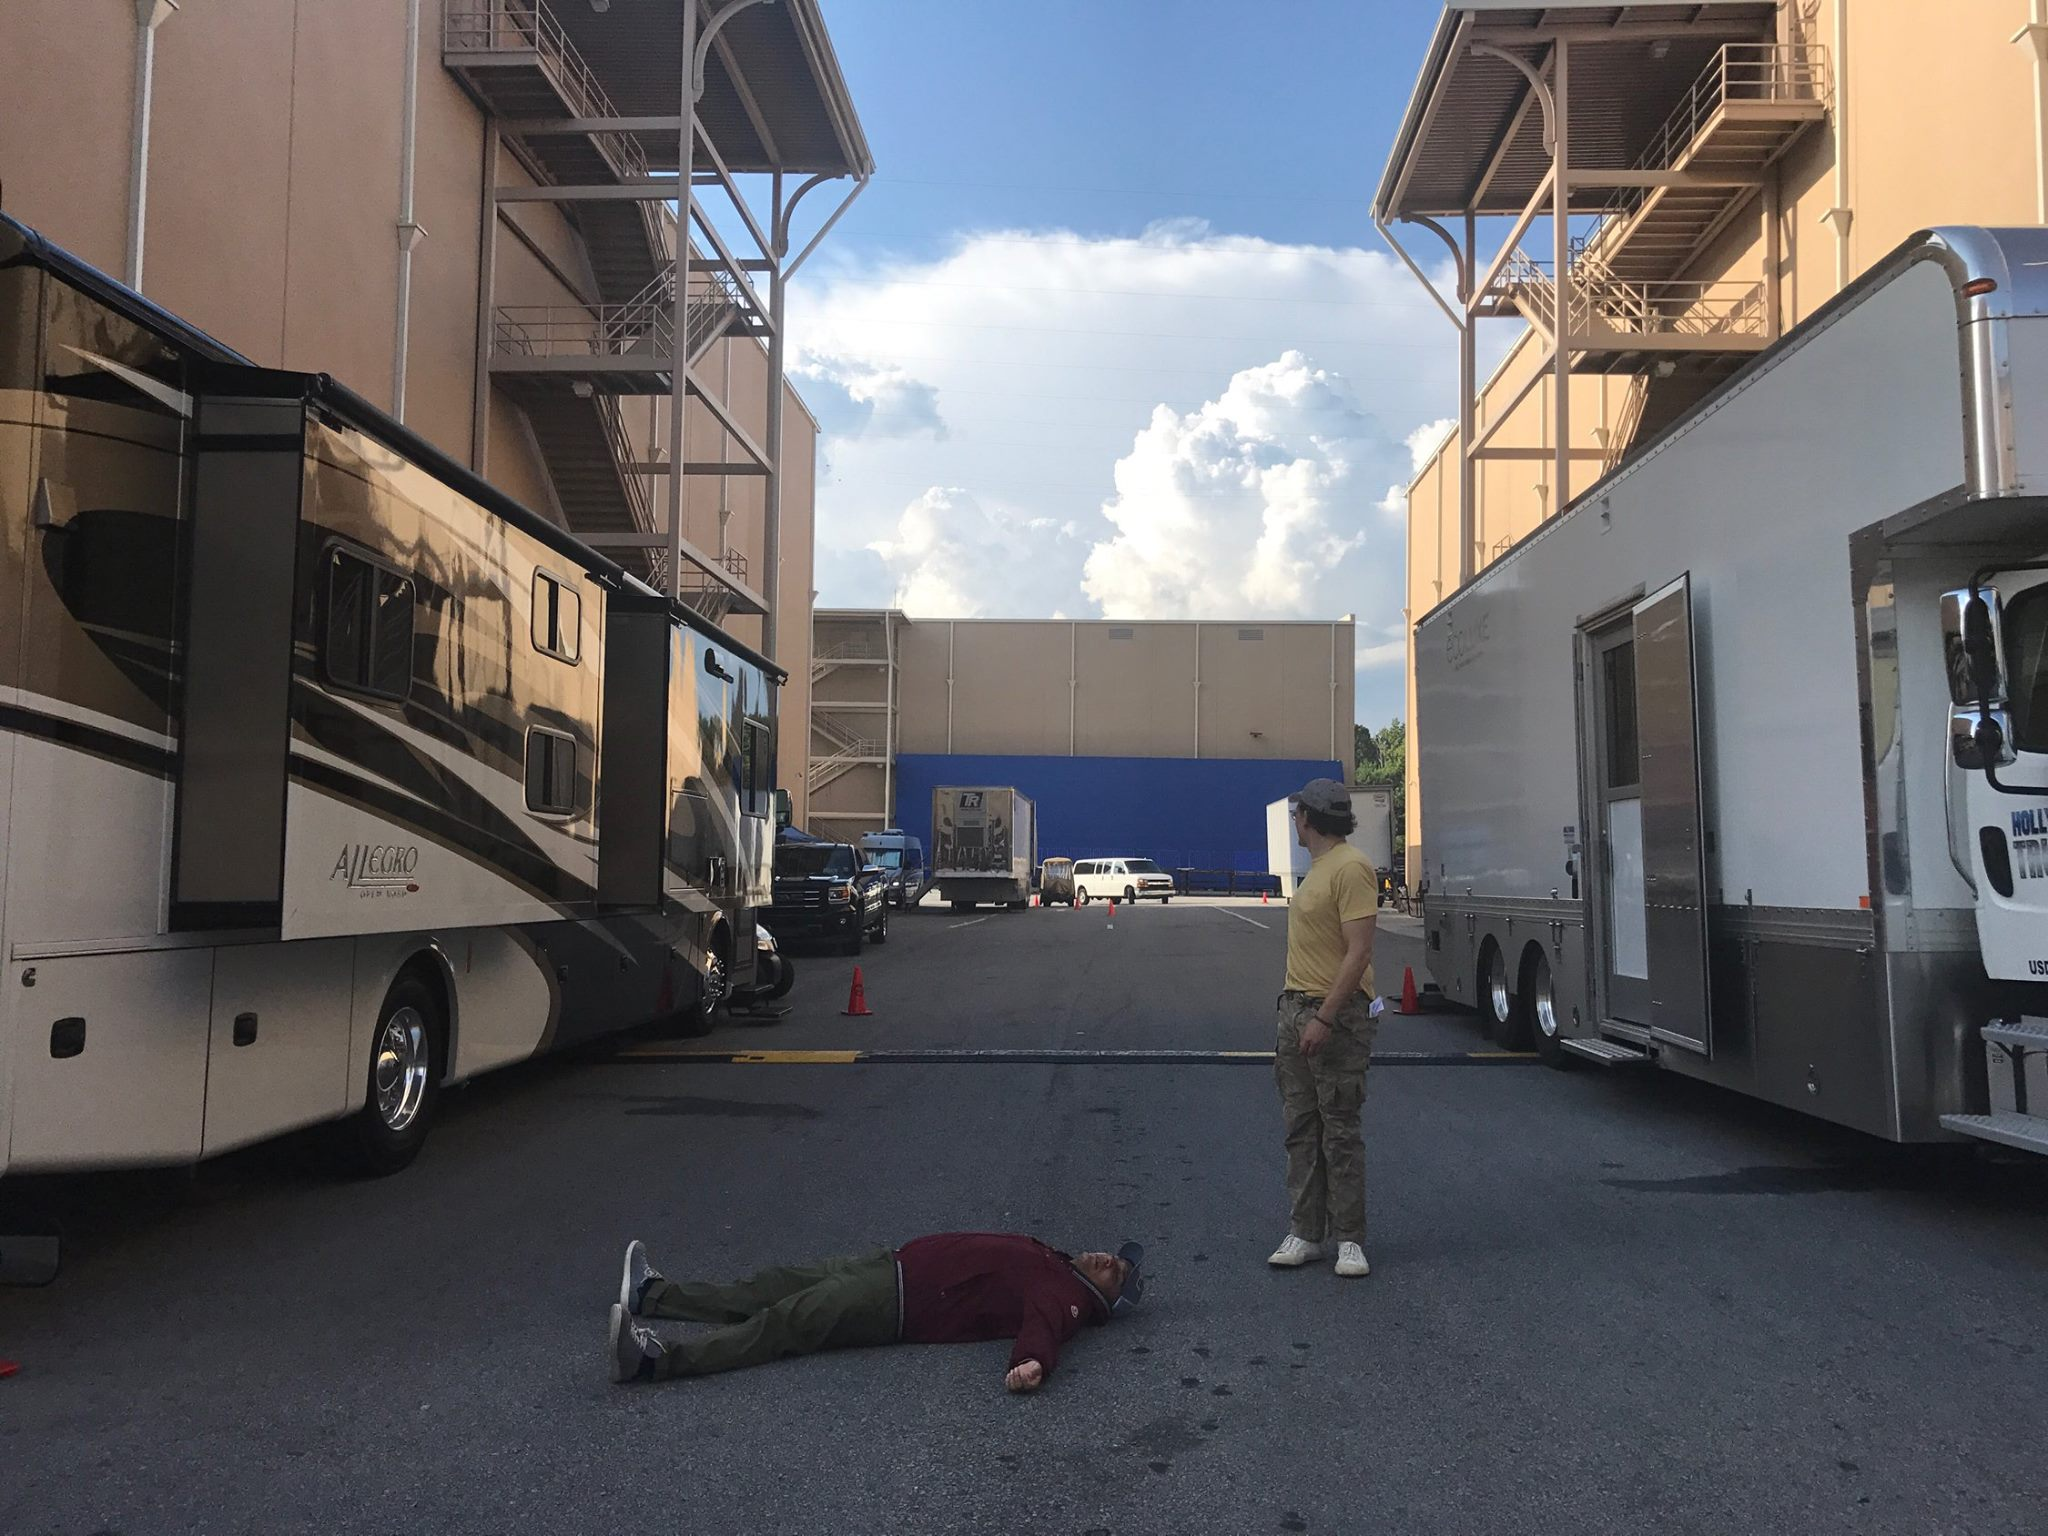 Fin du tournage d'Avengers: Infinity War avec Anthony et Joe Russo